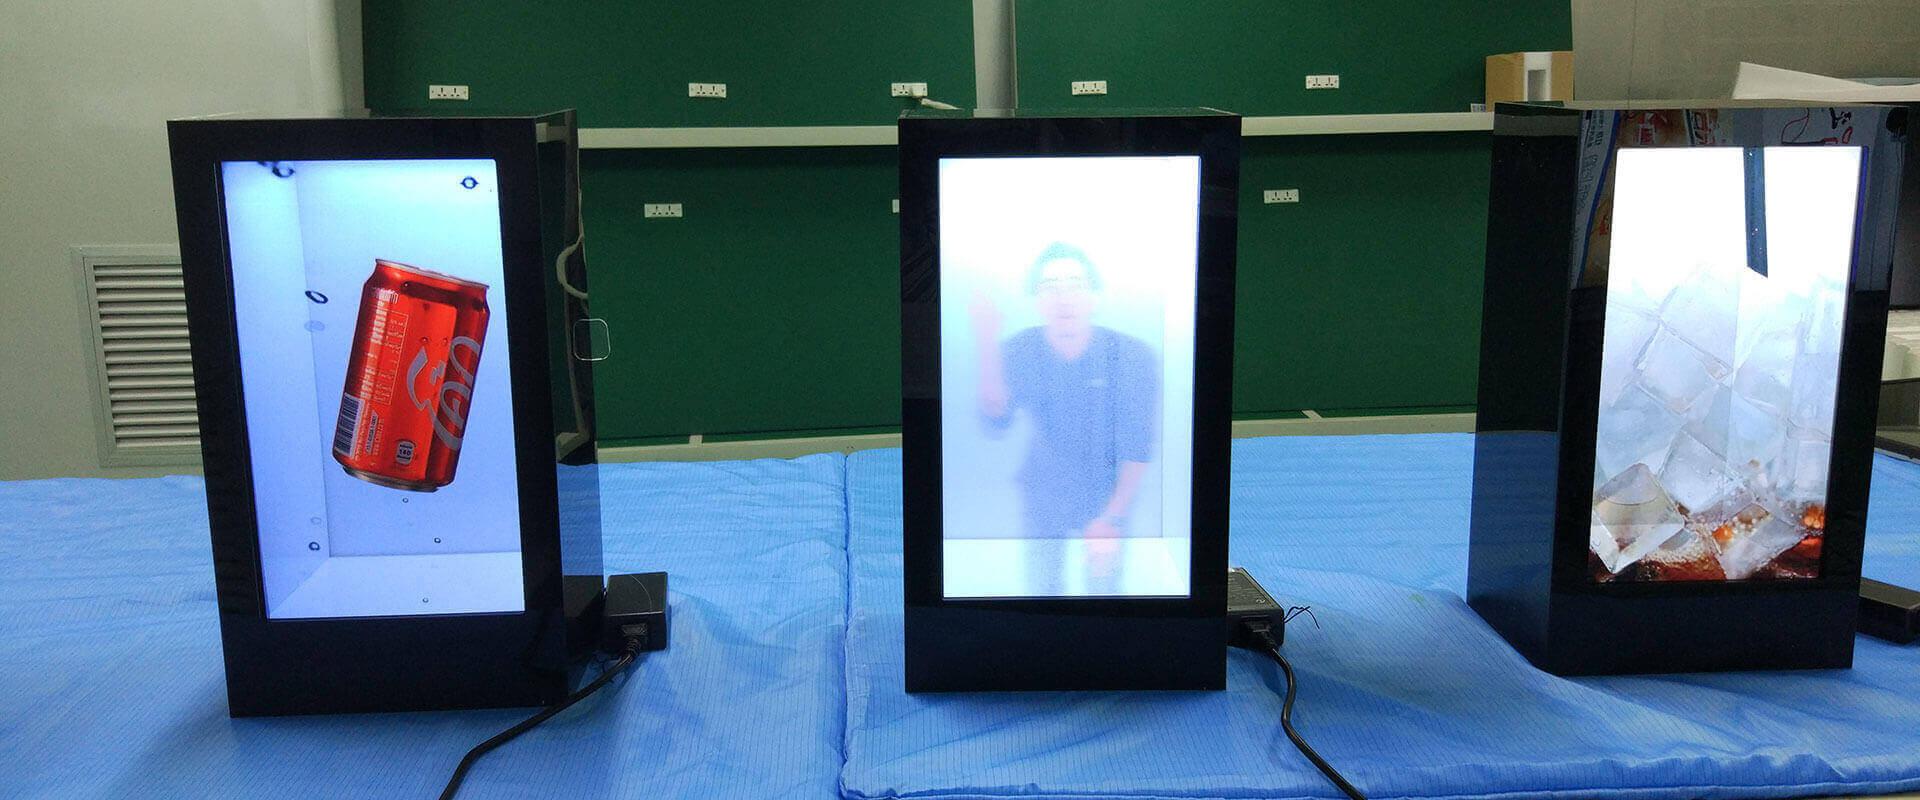 Transparent Display Screen Showcase